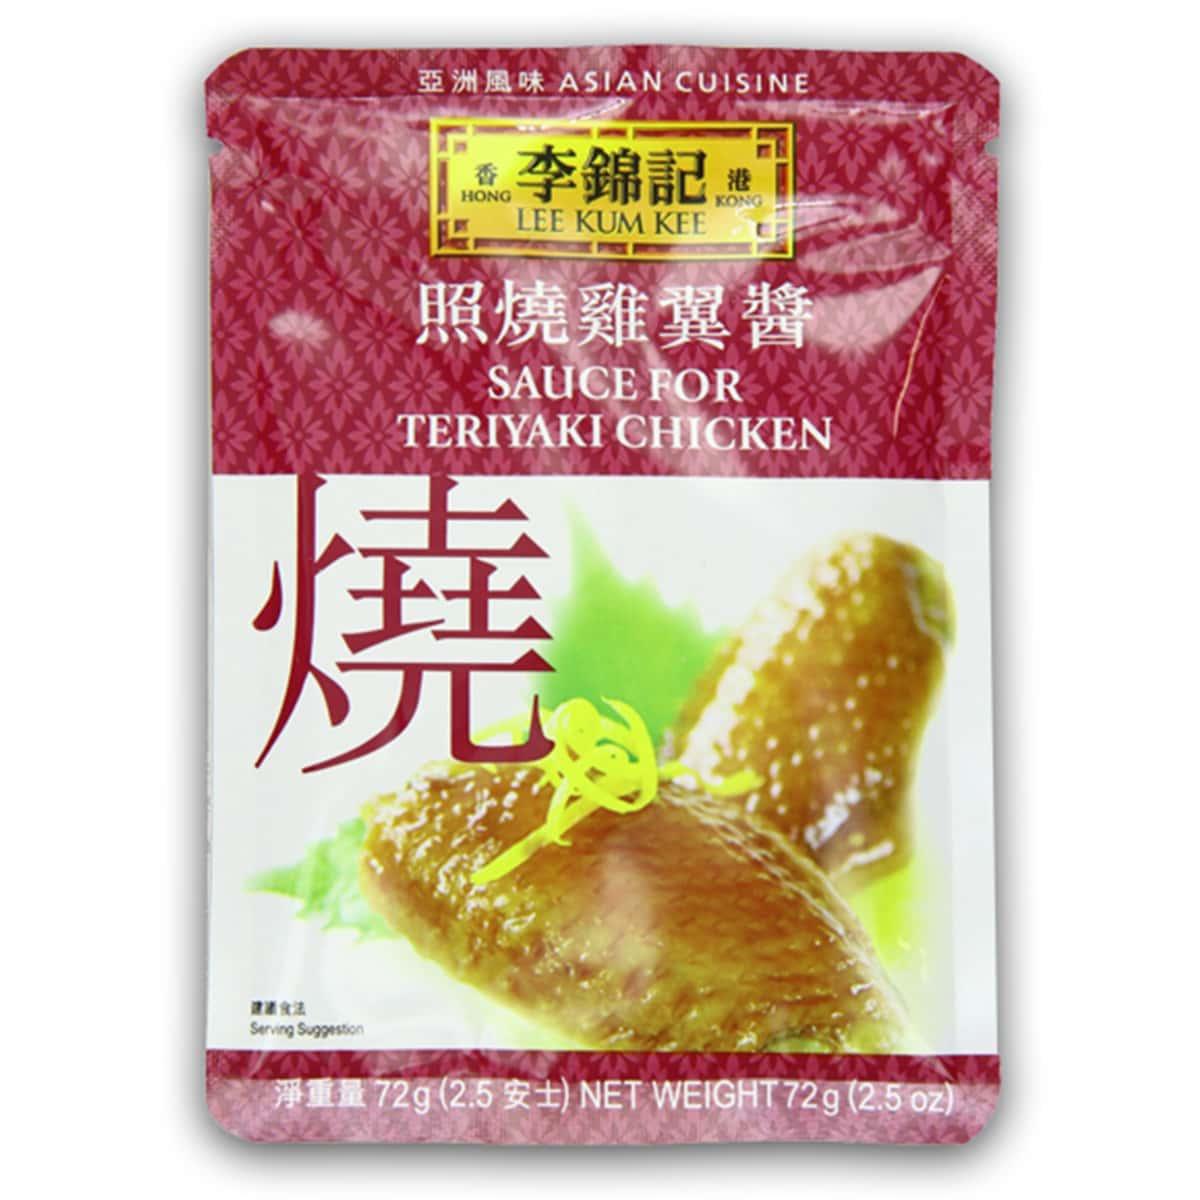 Buy Lee Kum Kee Sauce for Teriyaki Chicken - 72 gm